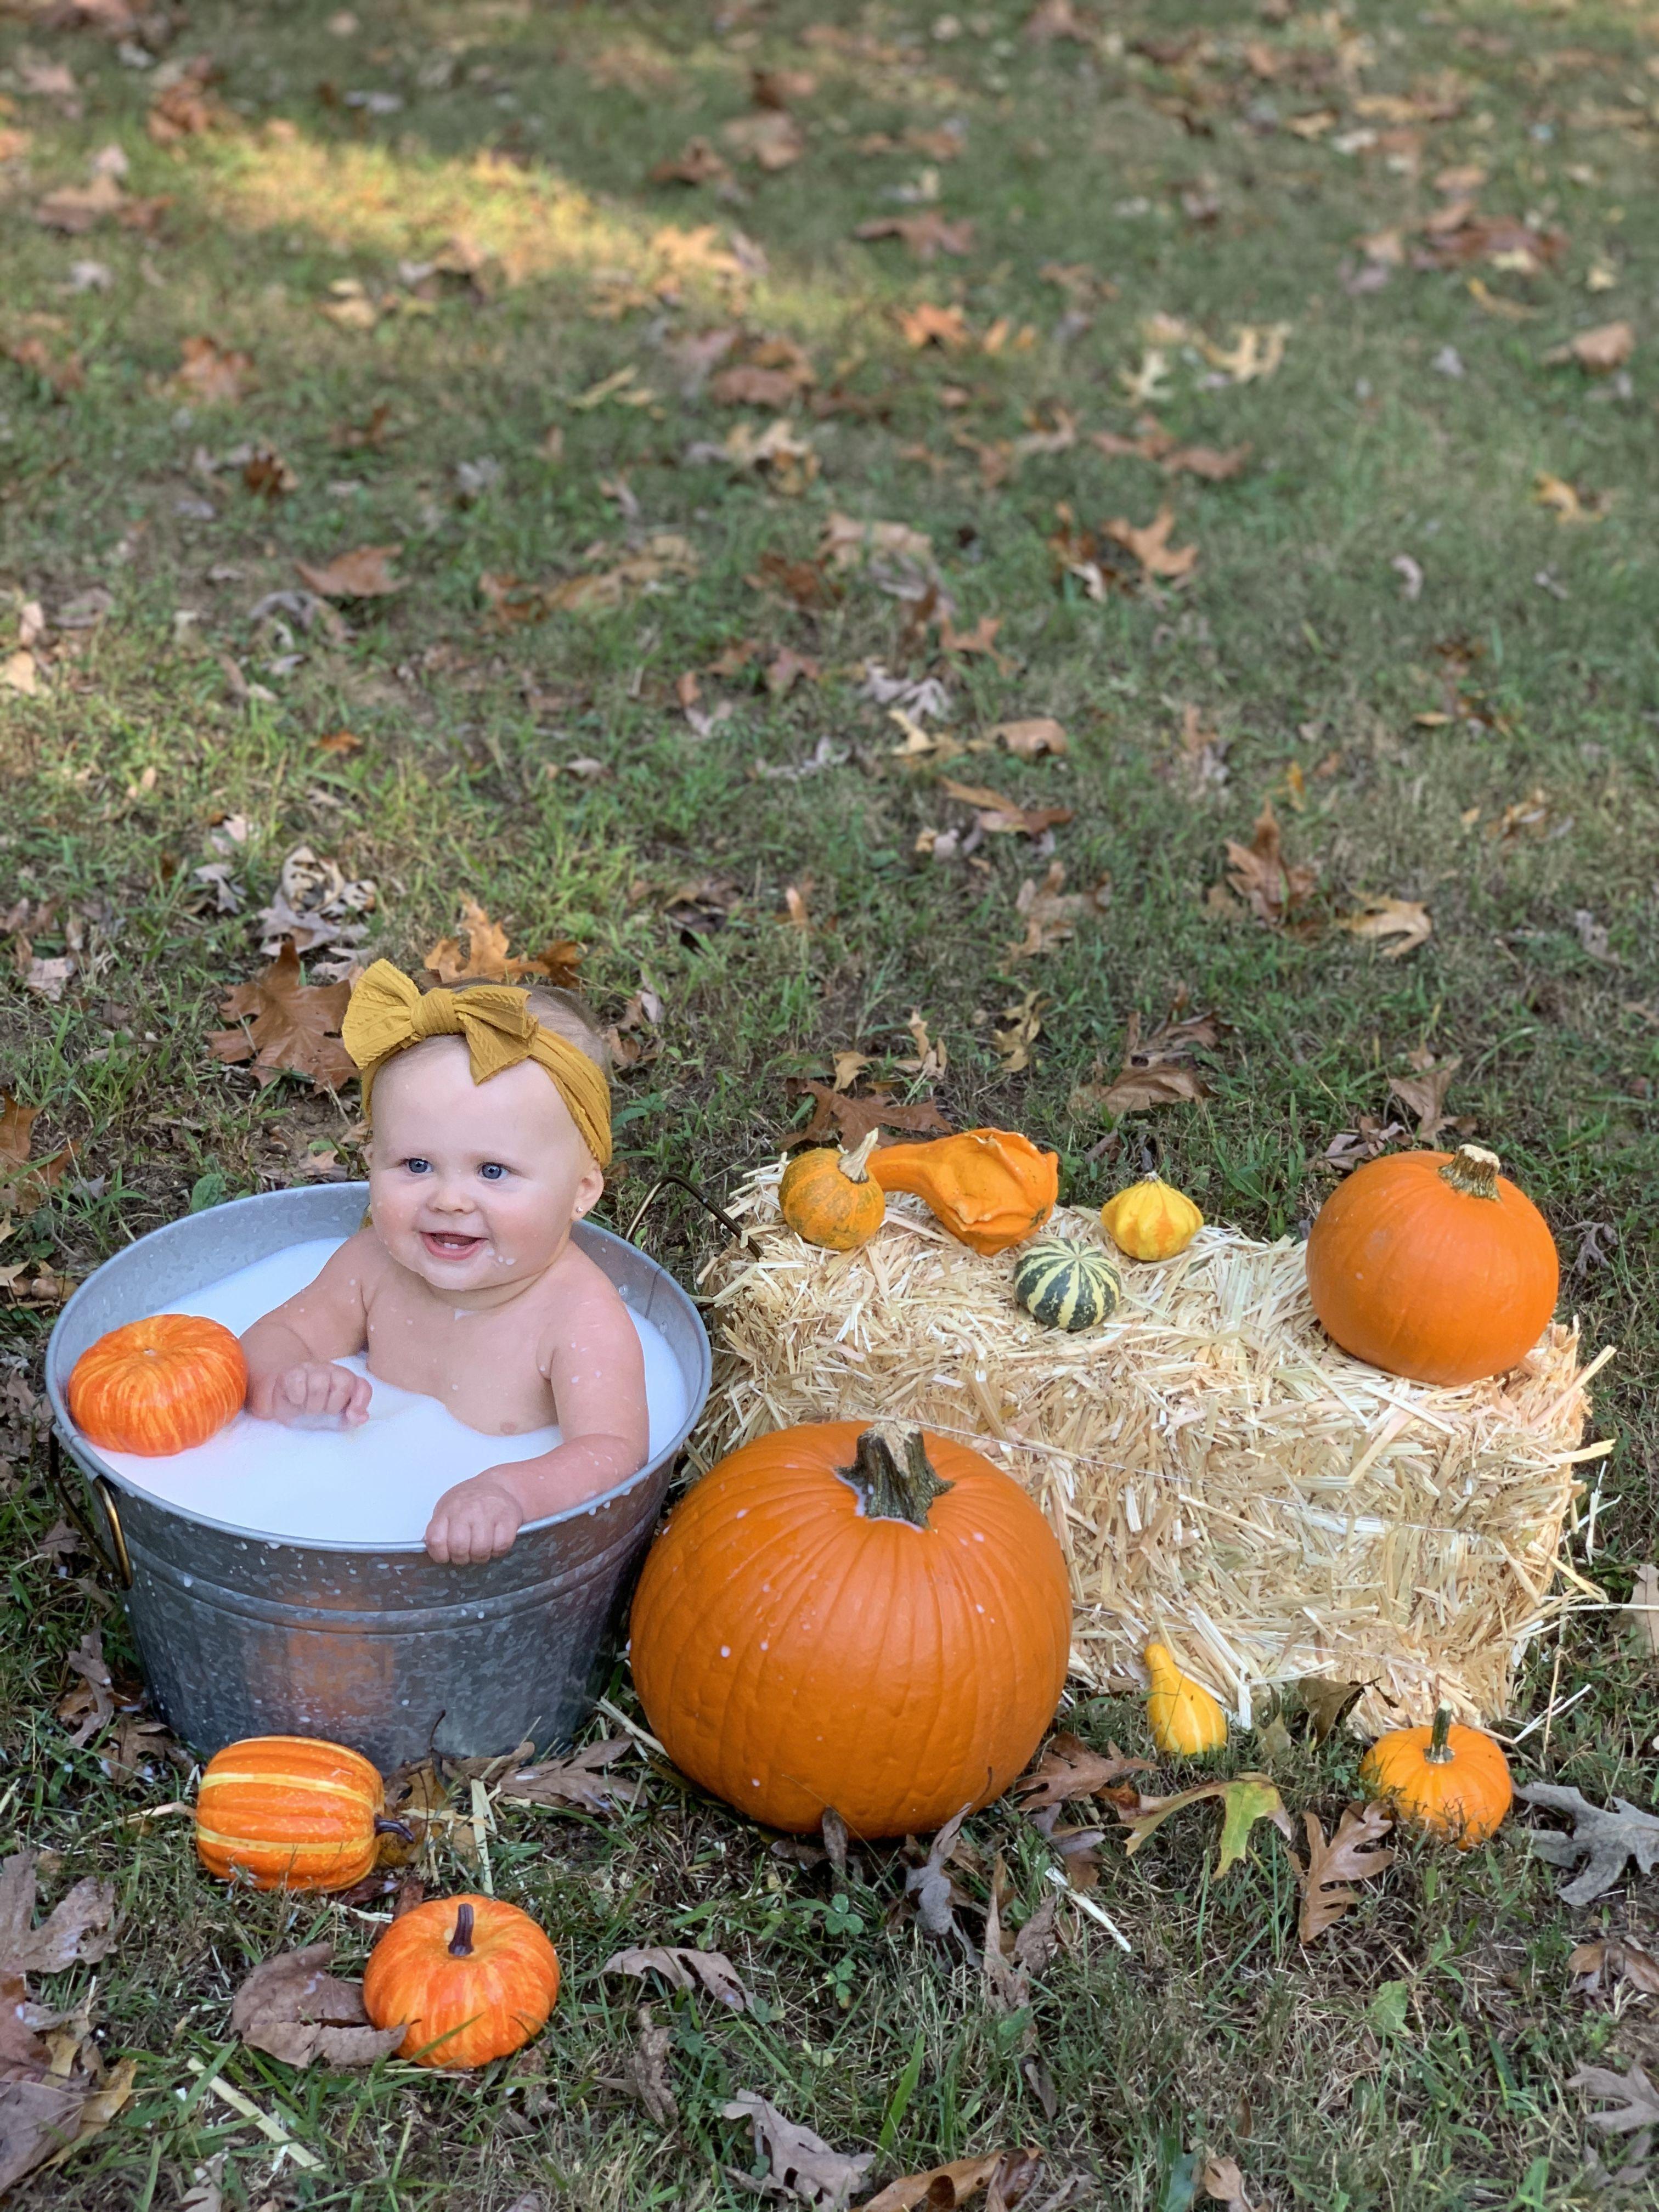 Fall baby milk bath!! #fallfun #pumkinmilkbath #babymilkbath #fallmilkbathbaby #milkbath